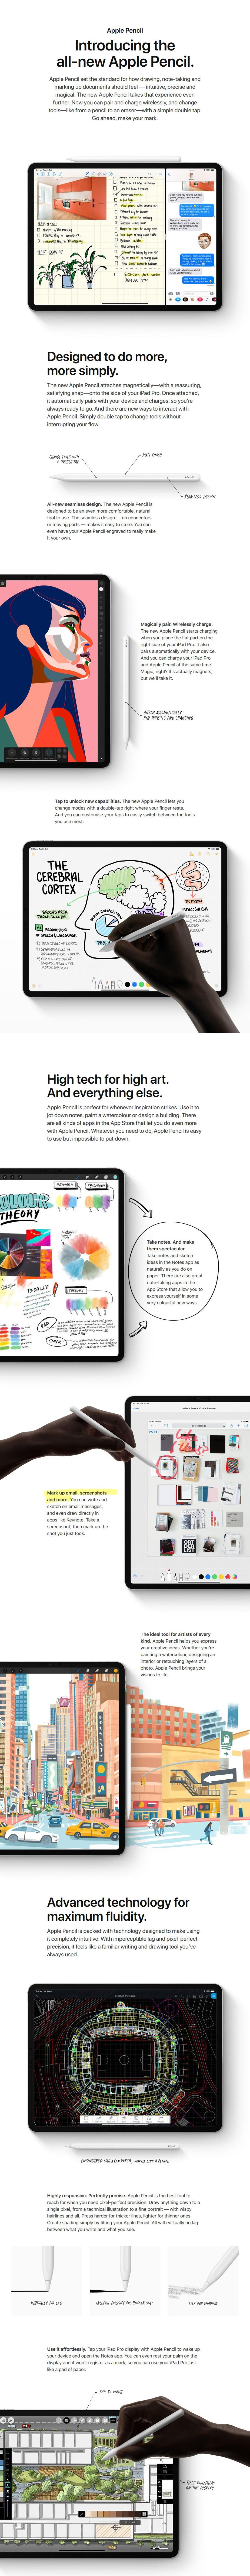 Apple Pencil (2nd Generation) - Desktop Overview 1